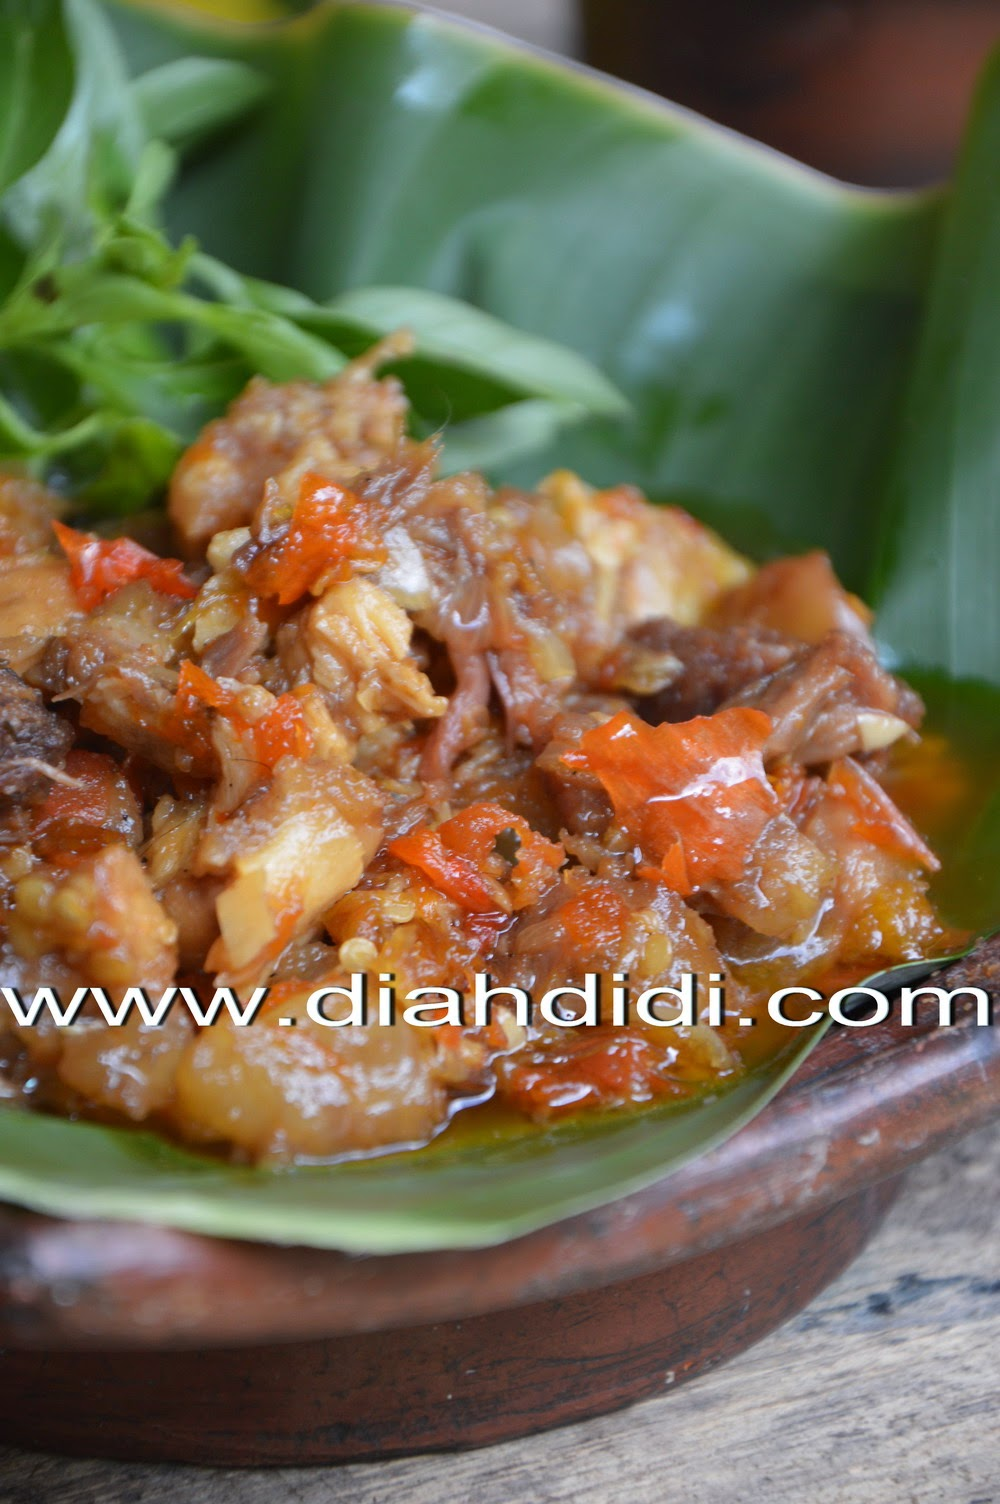 Resep Oseng Mercon Jogja Terkenal : resep, oseng, mercon, jogja, terkenal, Didi's, Kitchen:, Oseng, Koyor, Mercon..^^